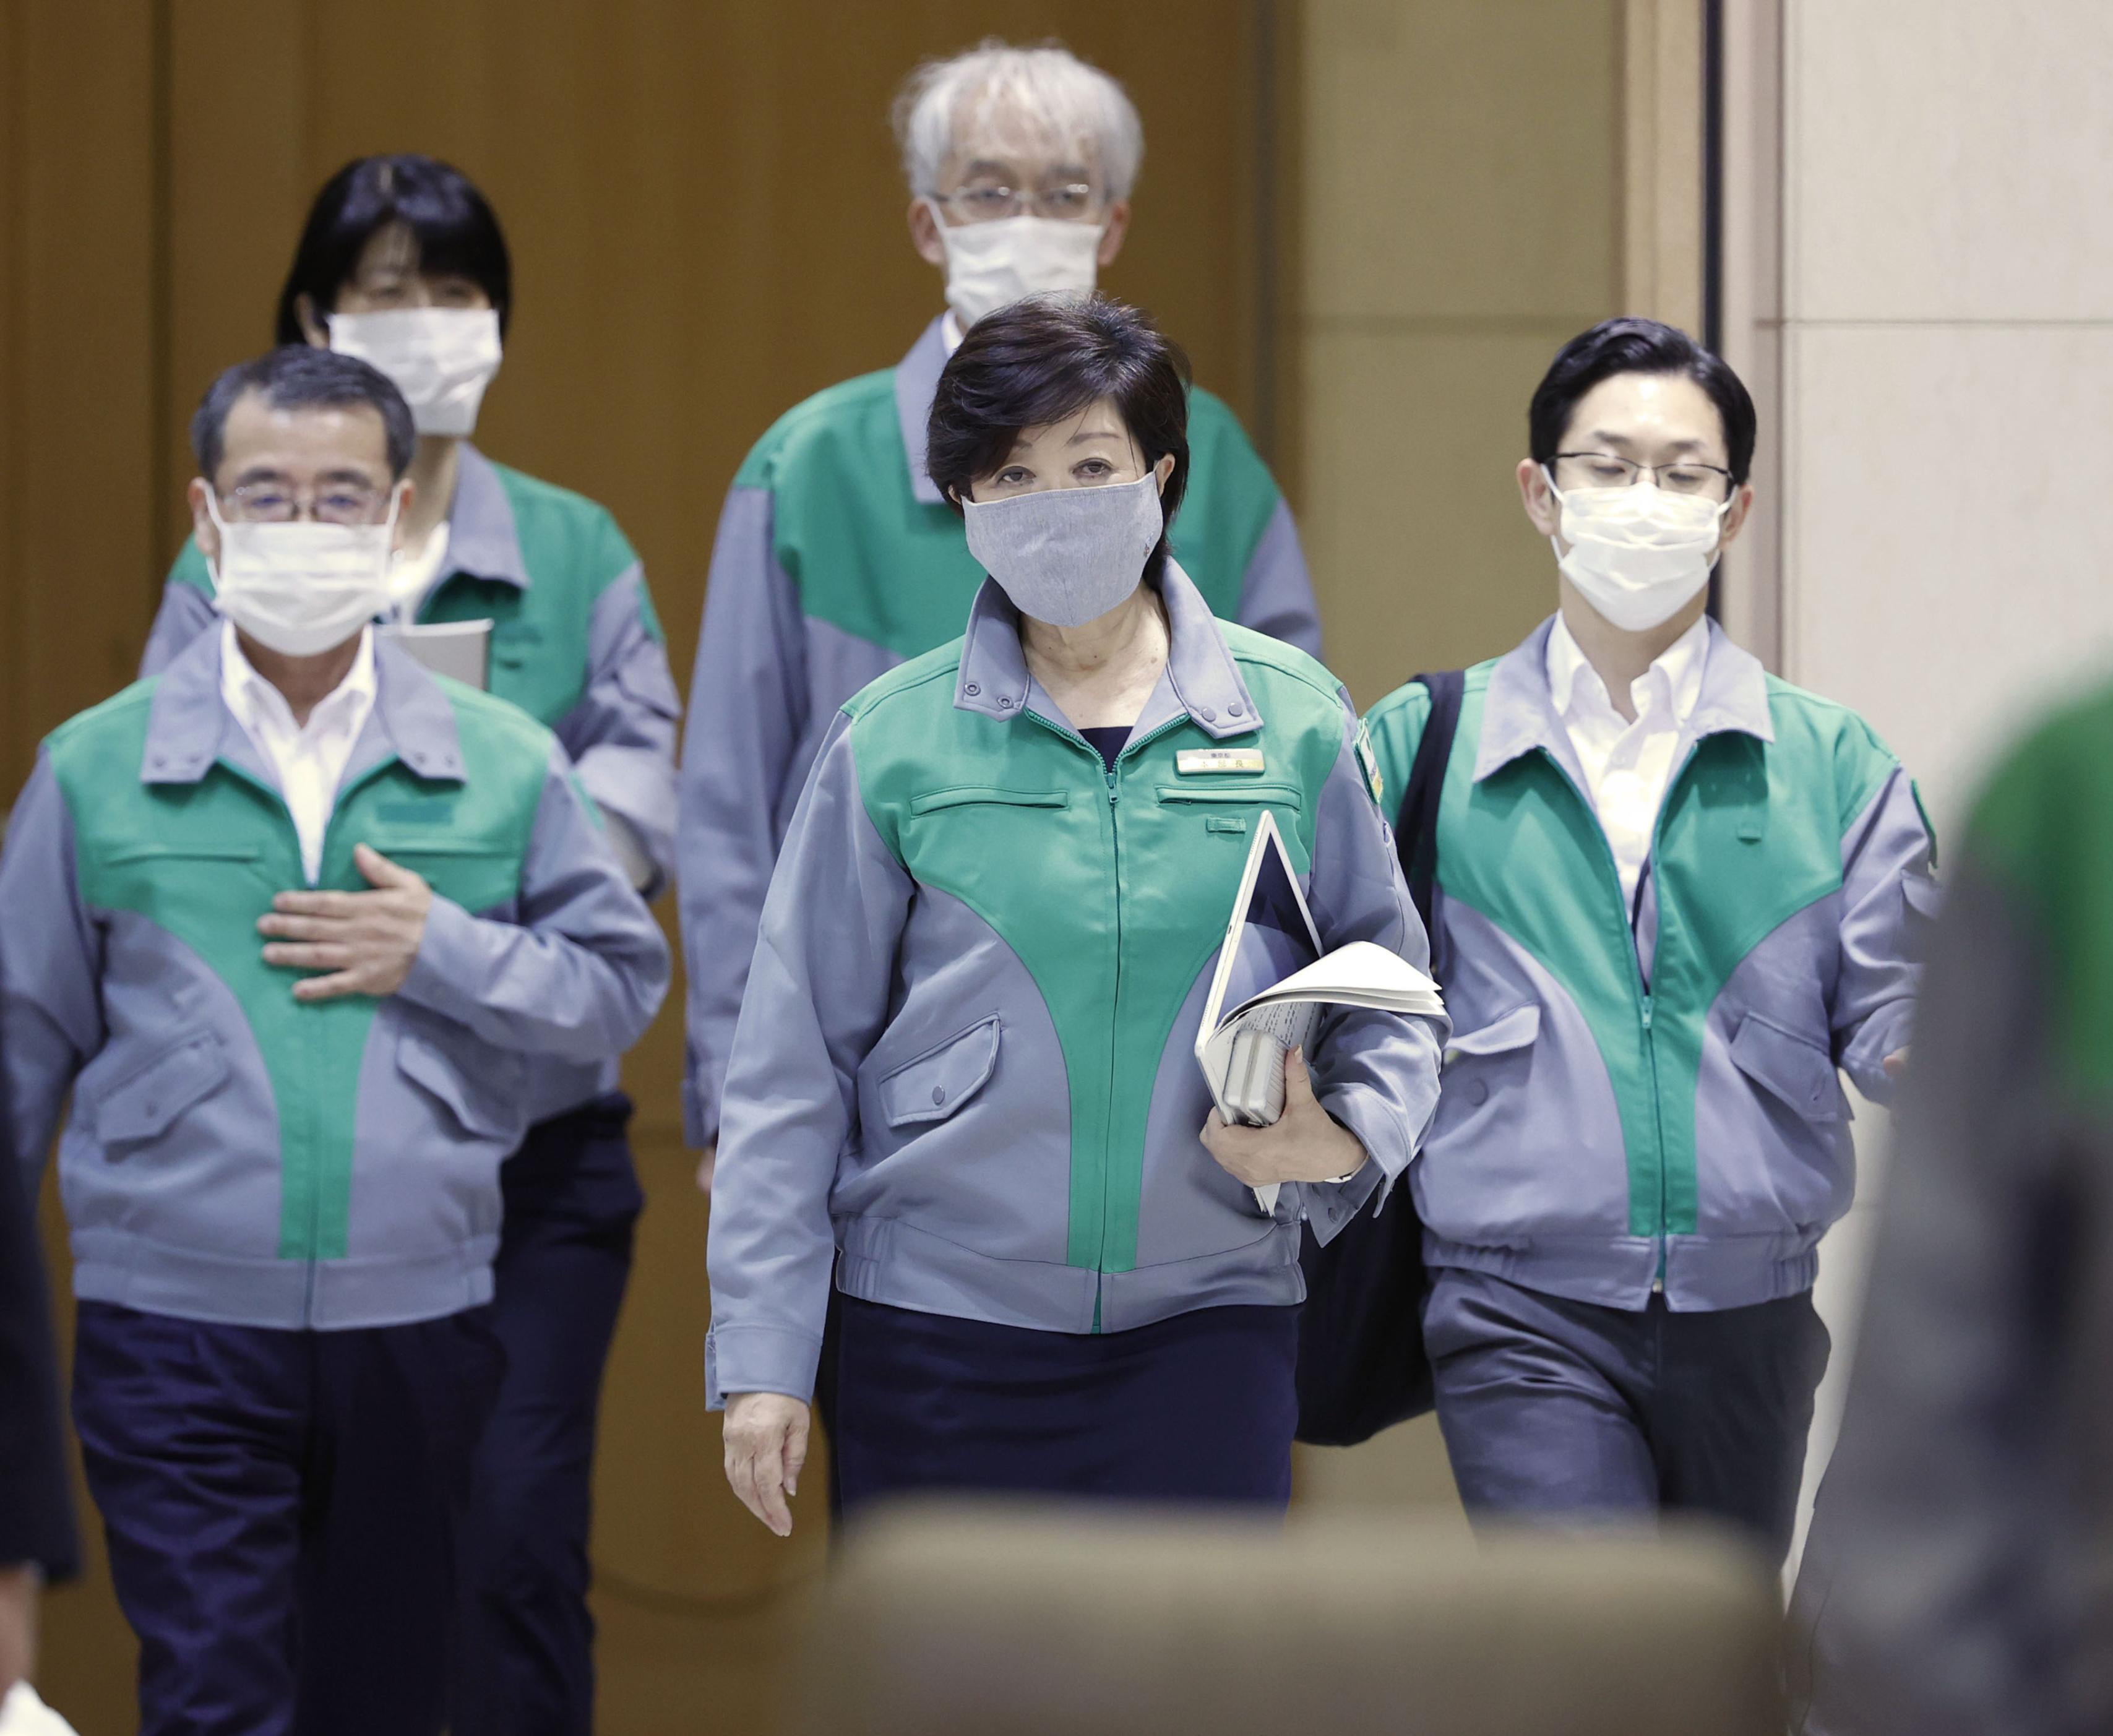 Tokyo Gov. Yuriko Koike (center) prepares to attend a coronavirus taskforce meeting at the metropolitan government building on June 2.